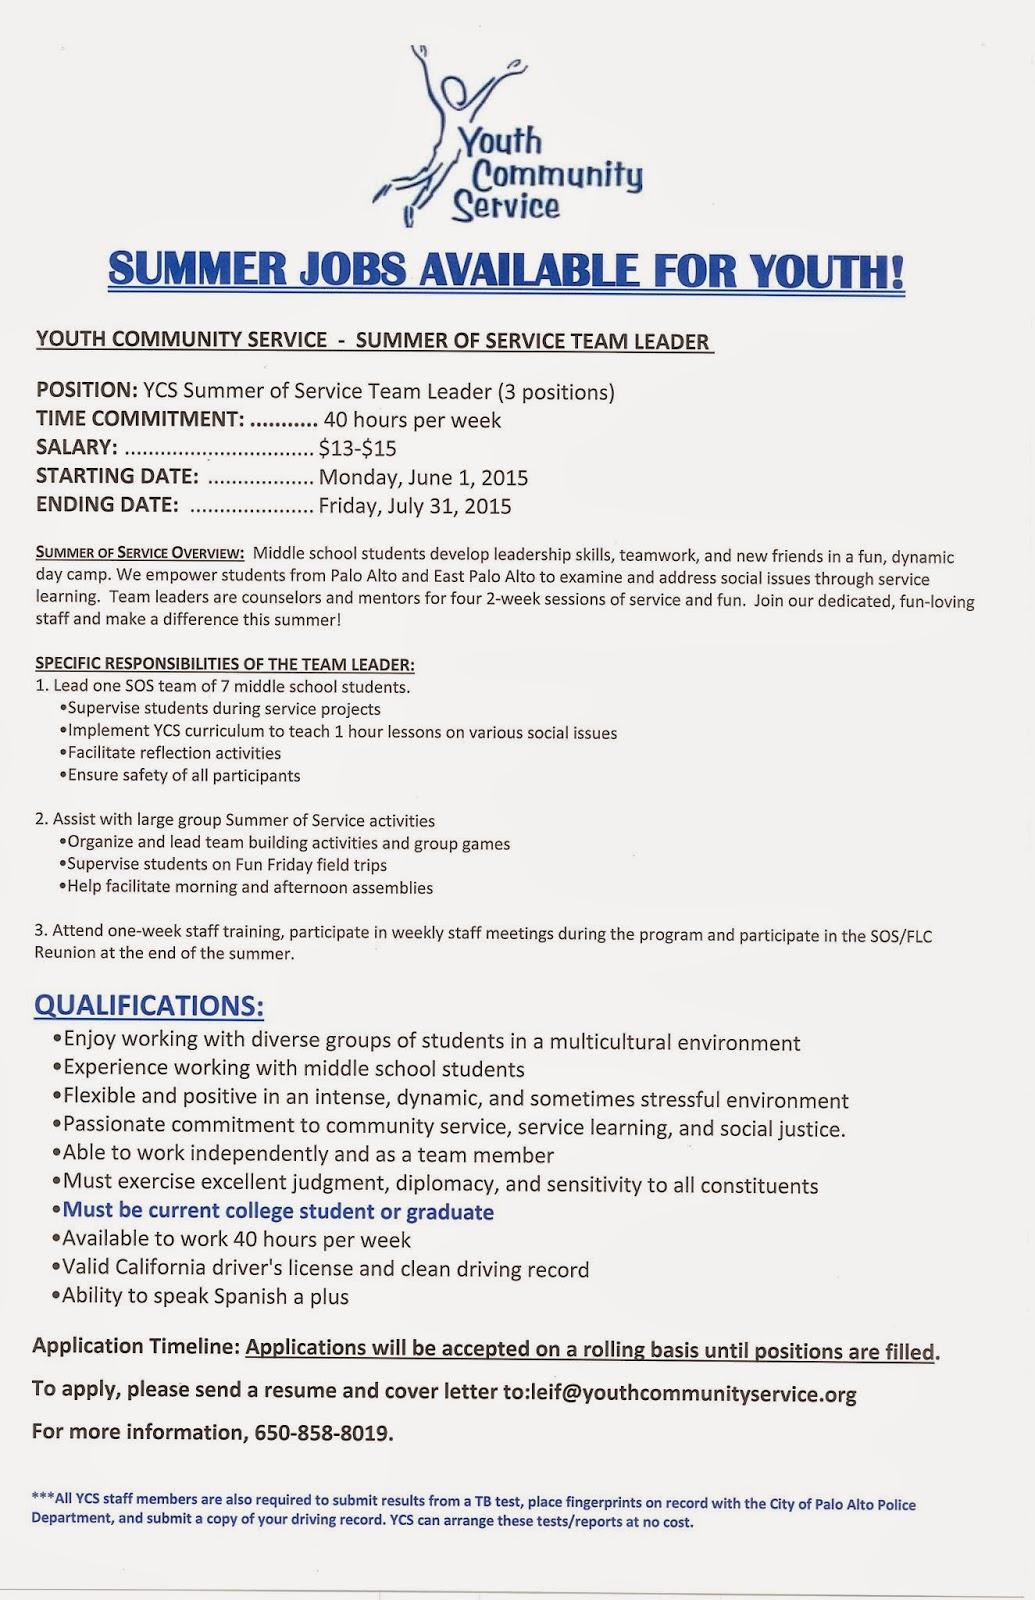 Shinnyo-en USA Head Temple : Summer Job for Youths at YCS